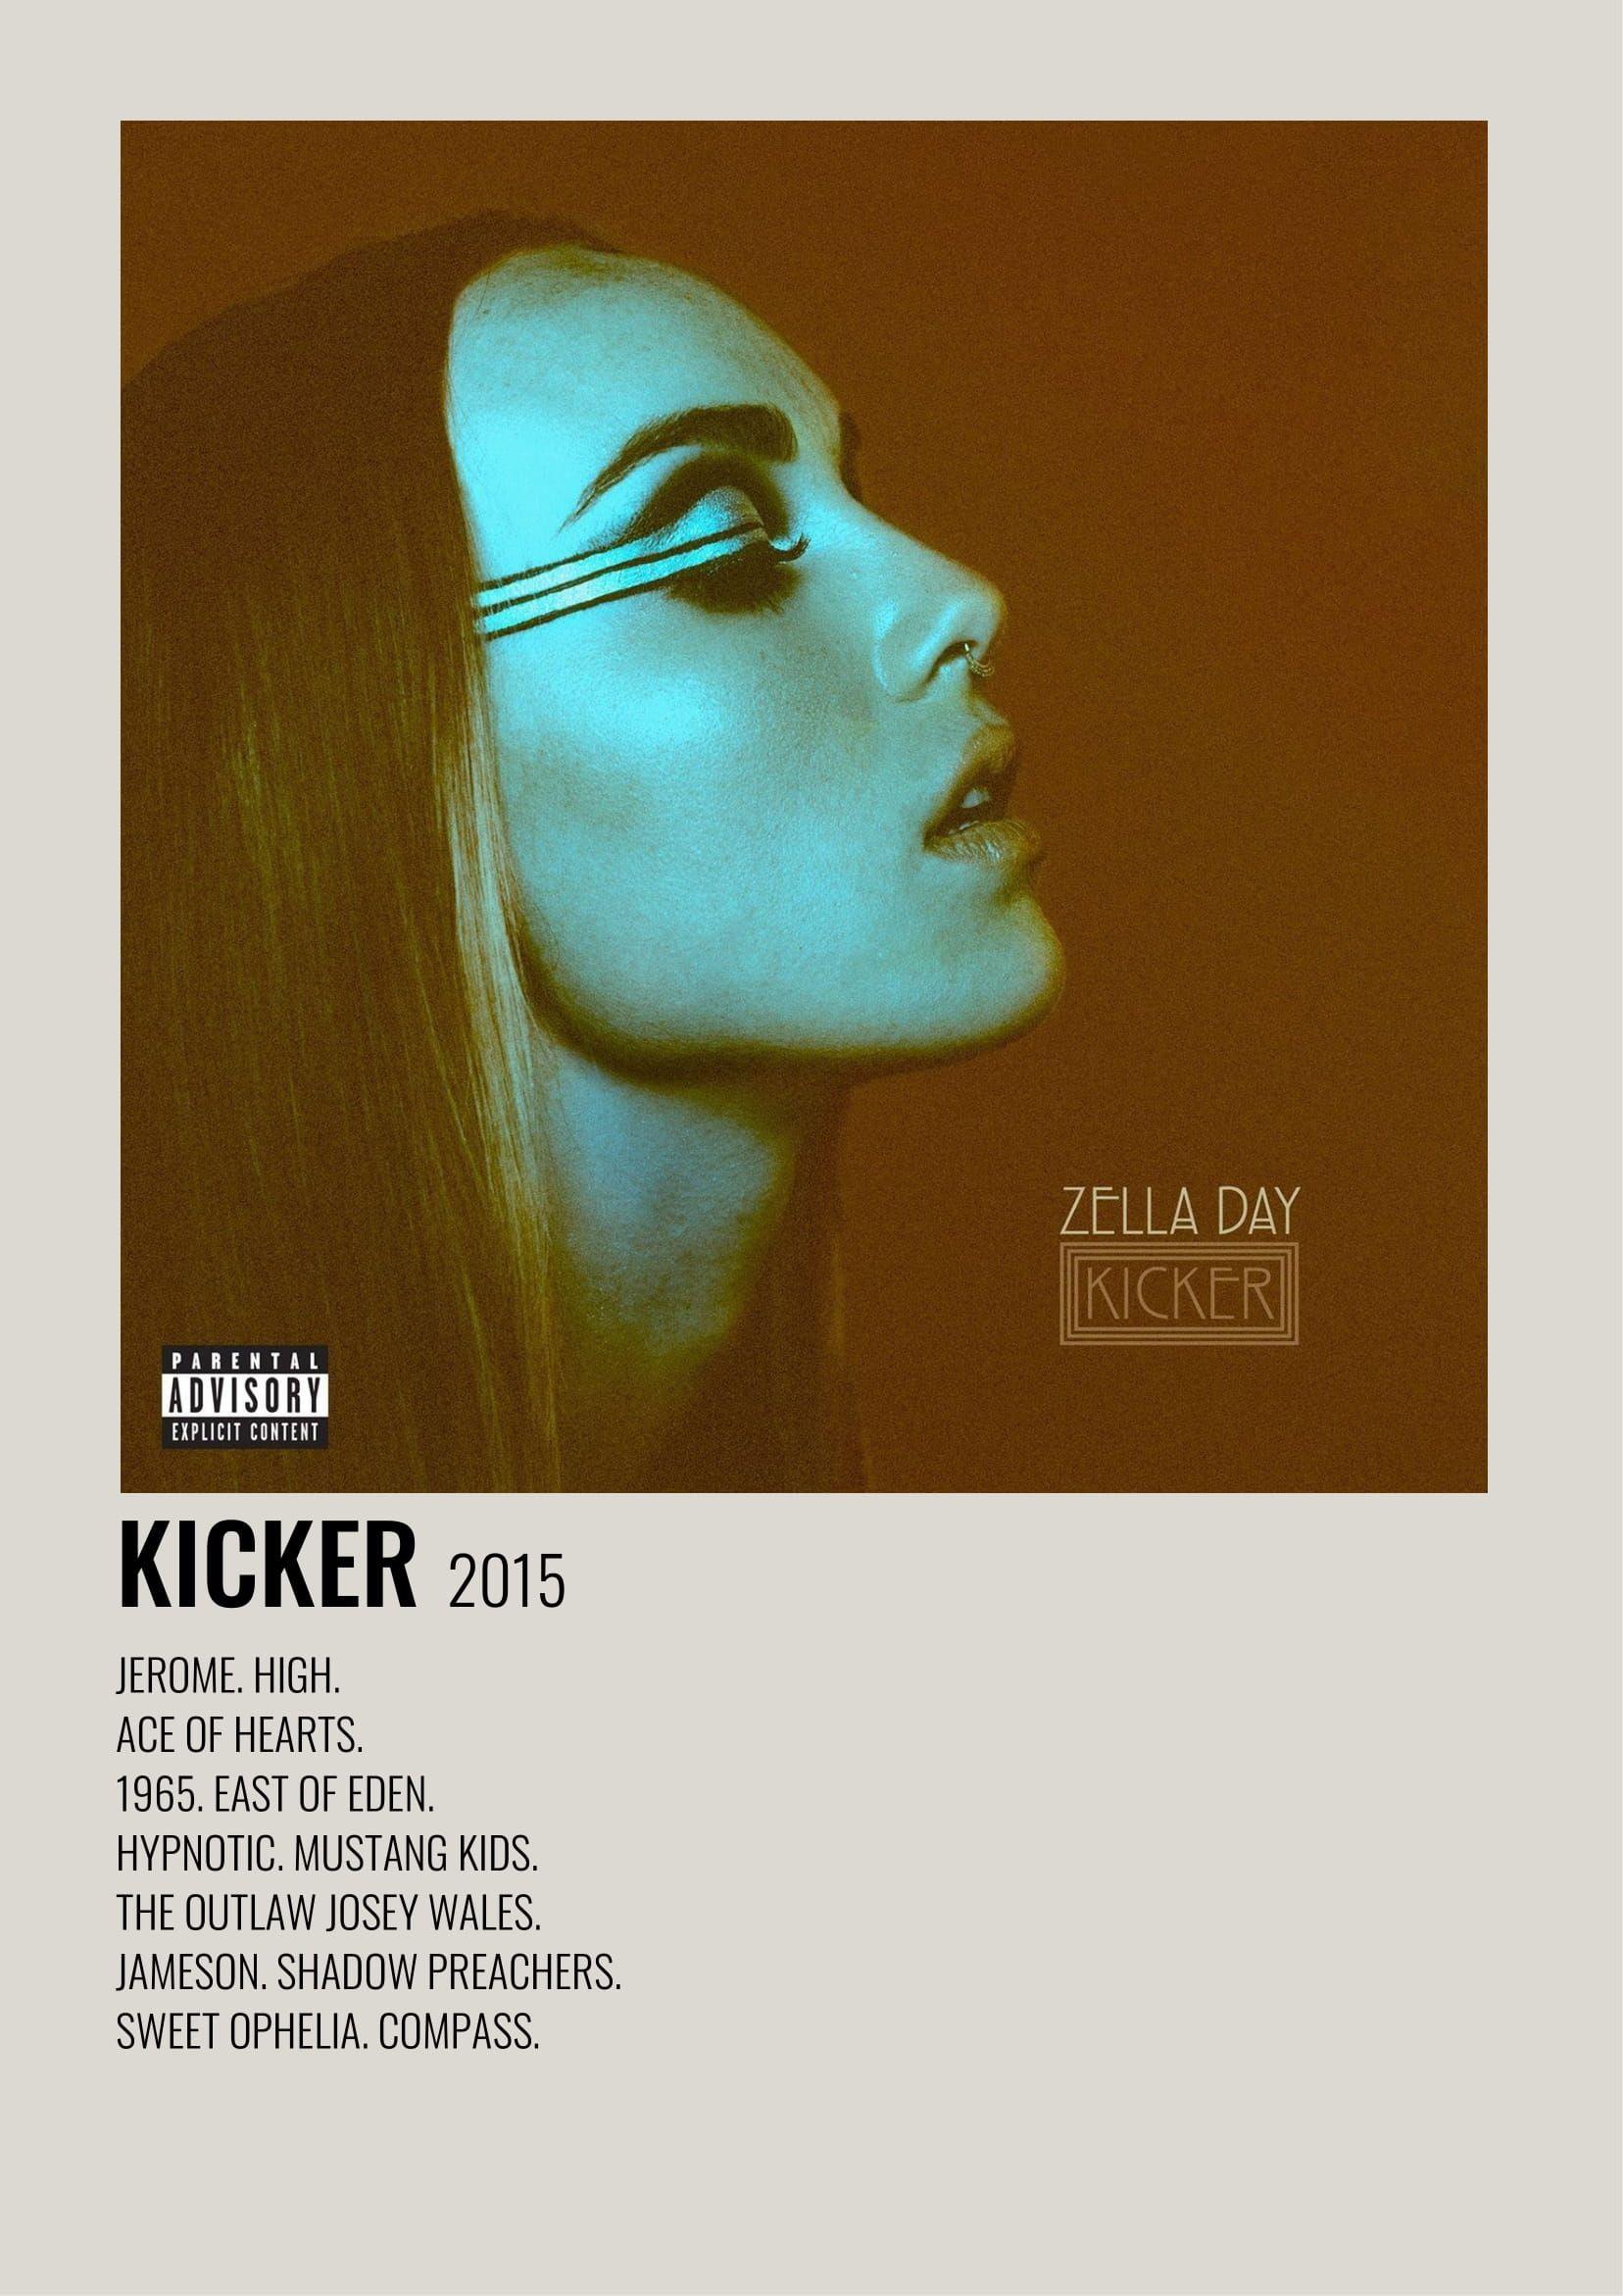 Kicker Zella Day Music Poster